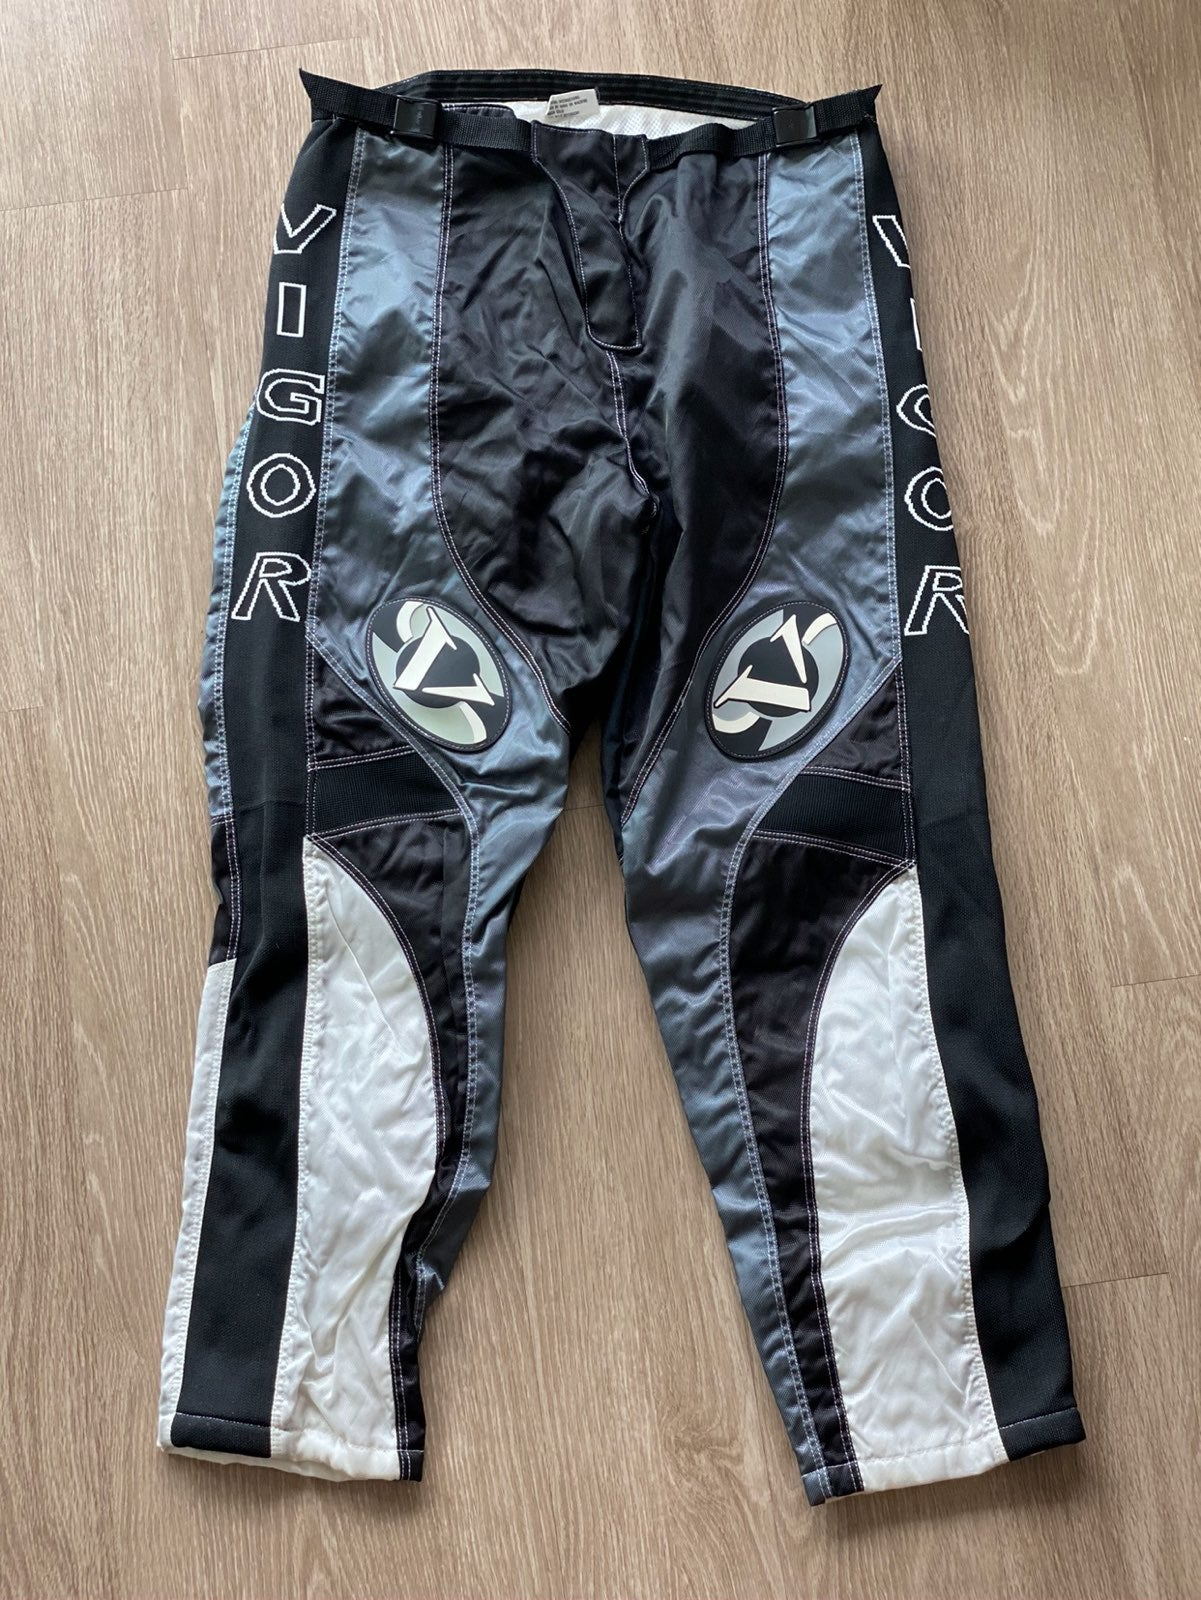 Vigor Motocross Pants Sz Lg